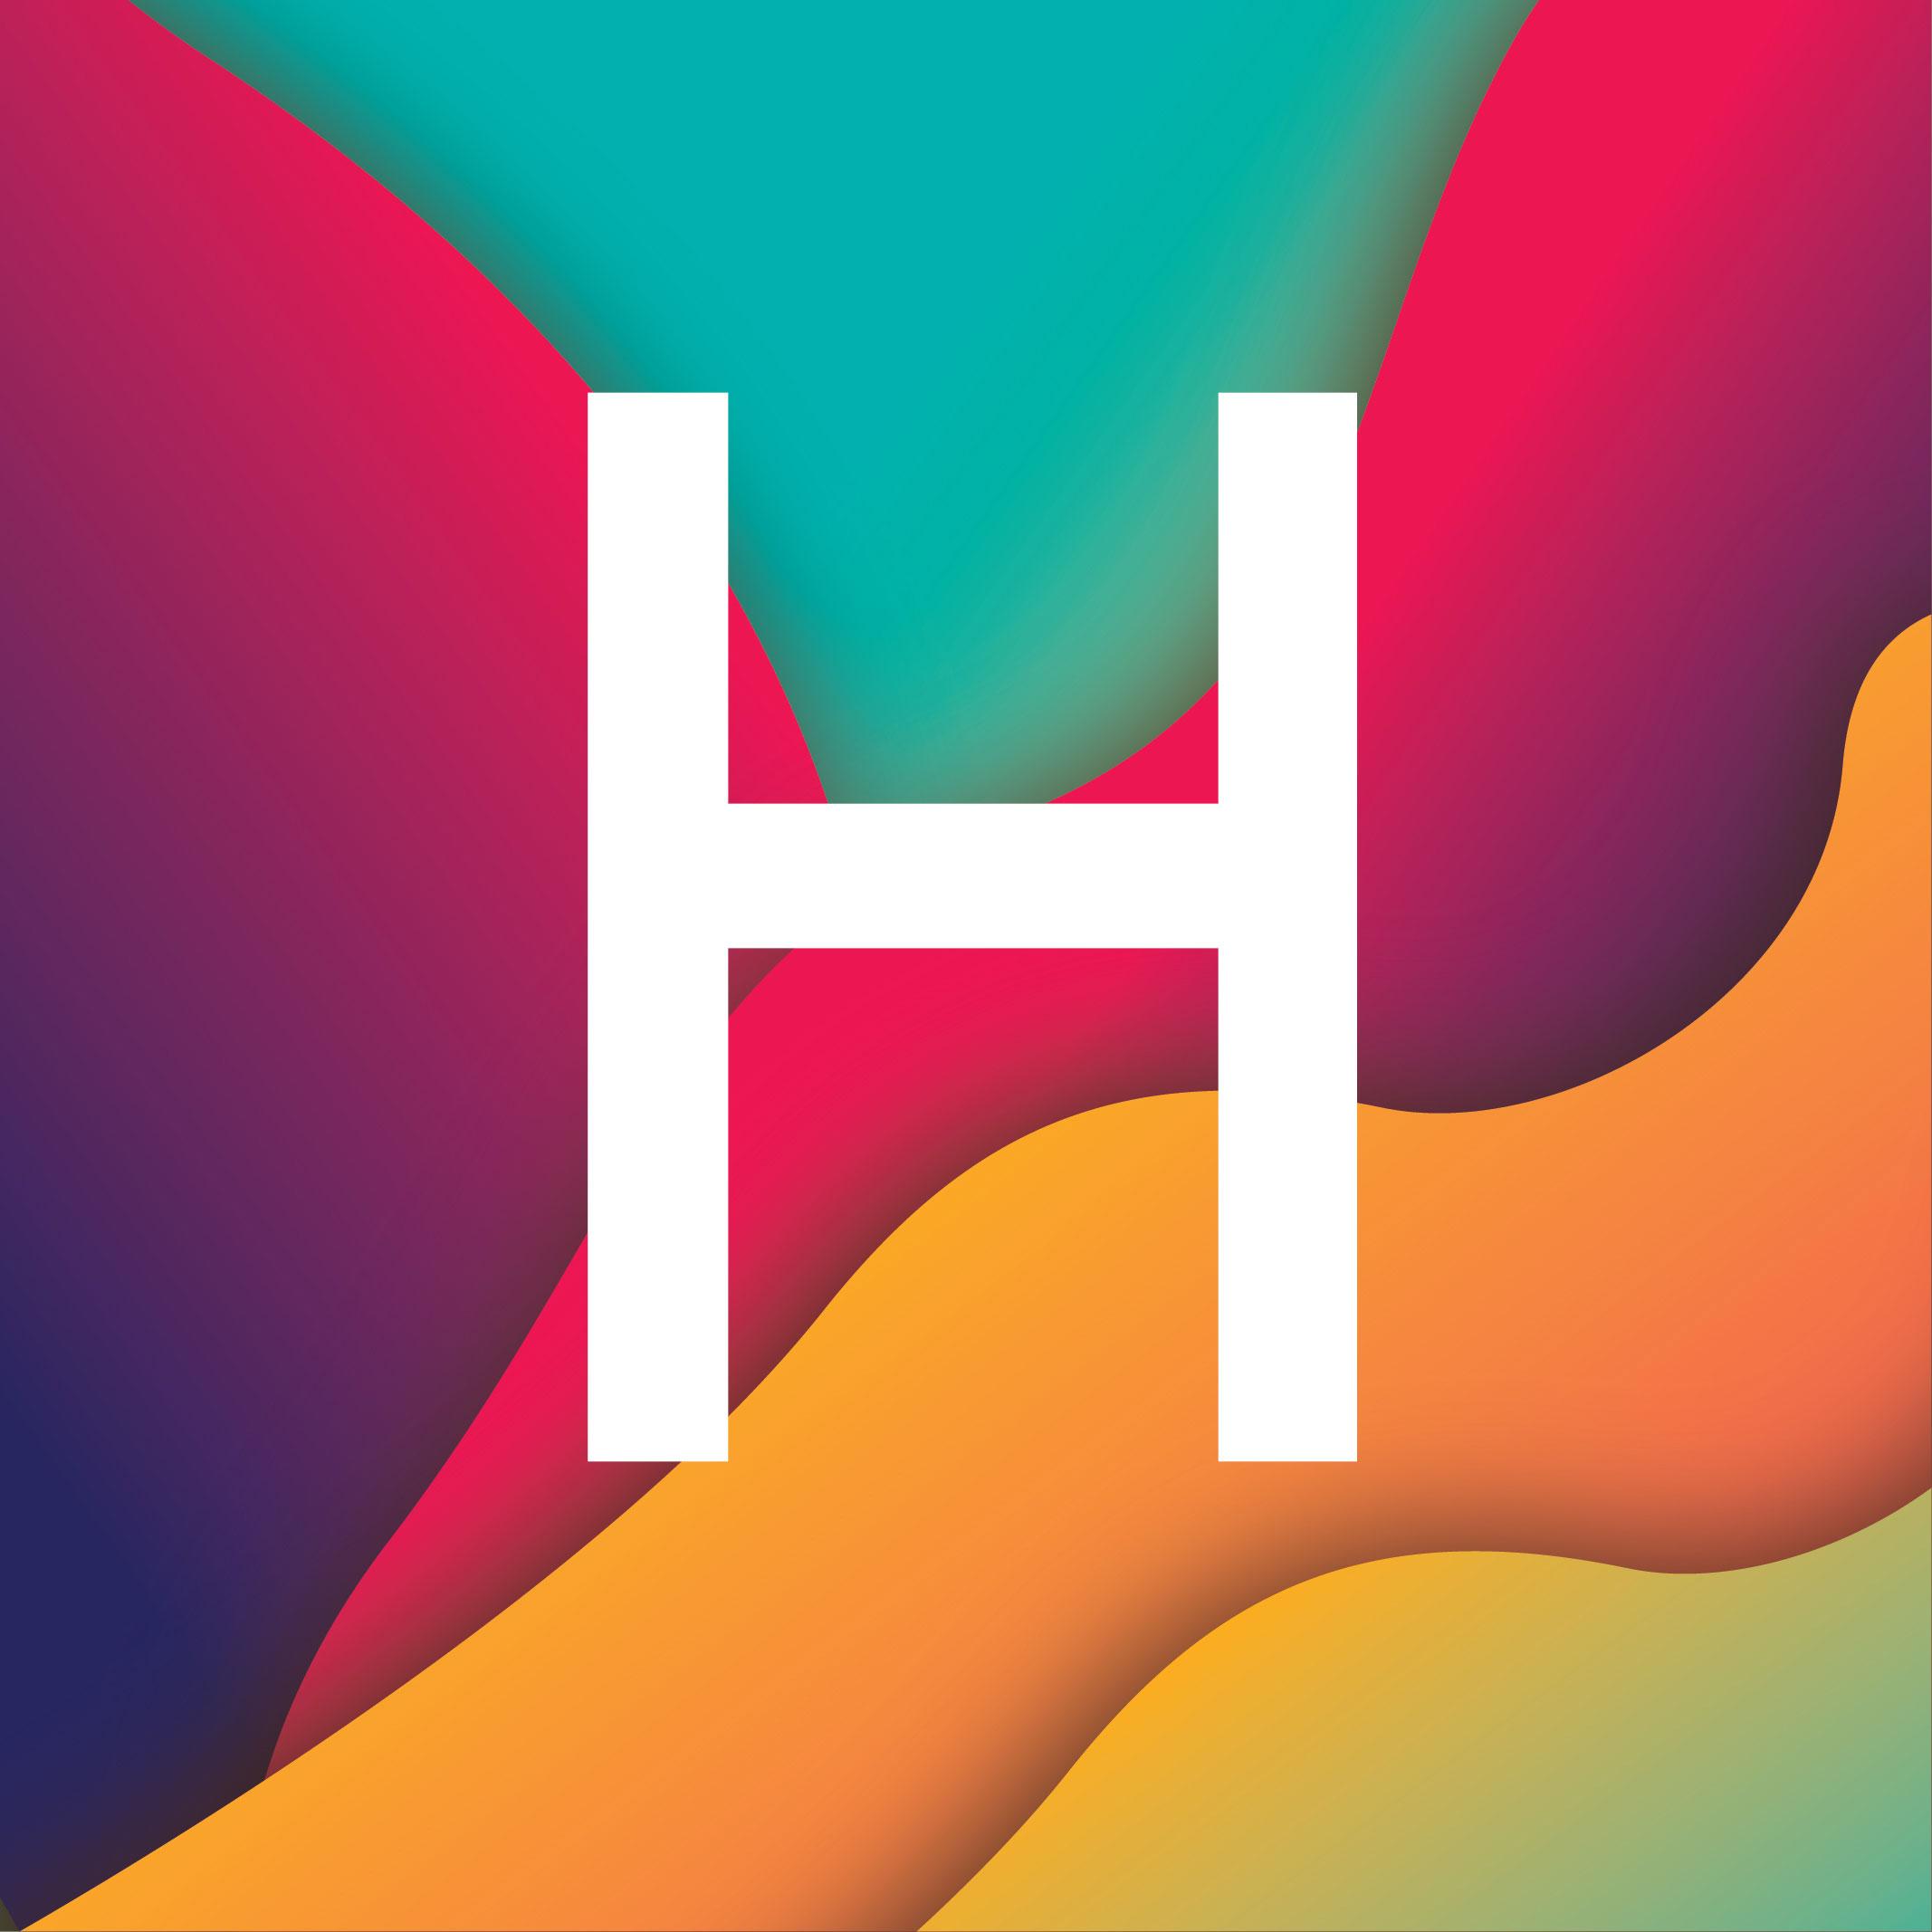 HANNAH_KONG